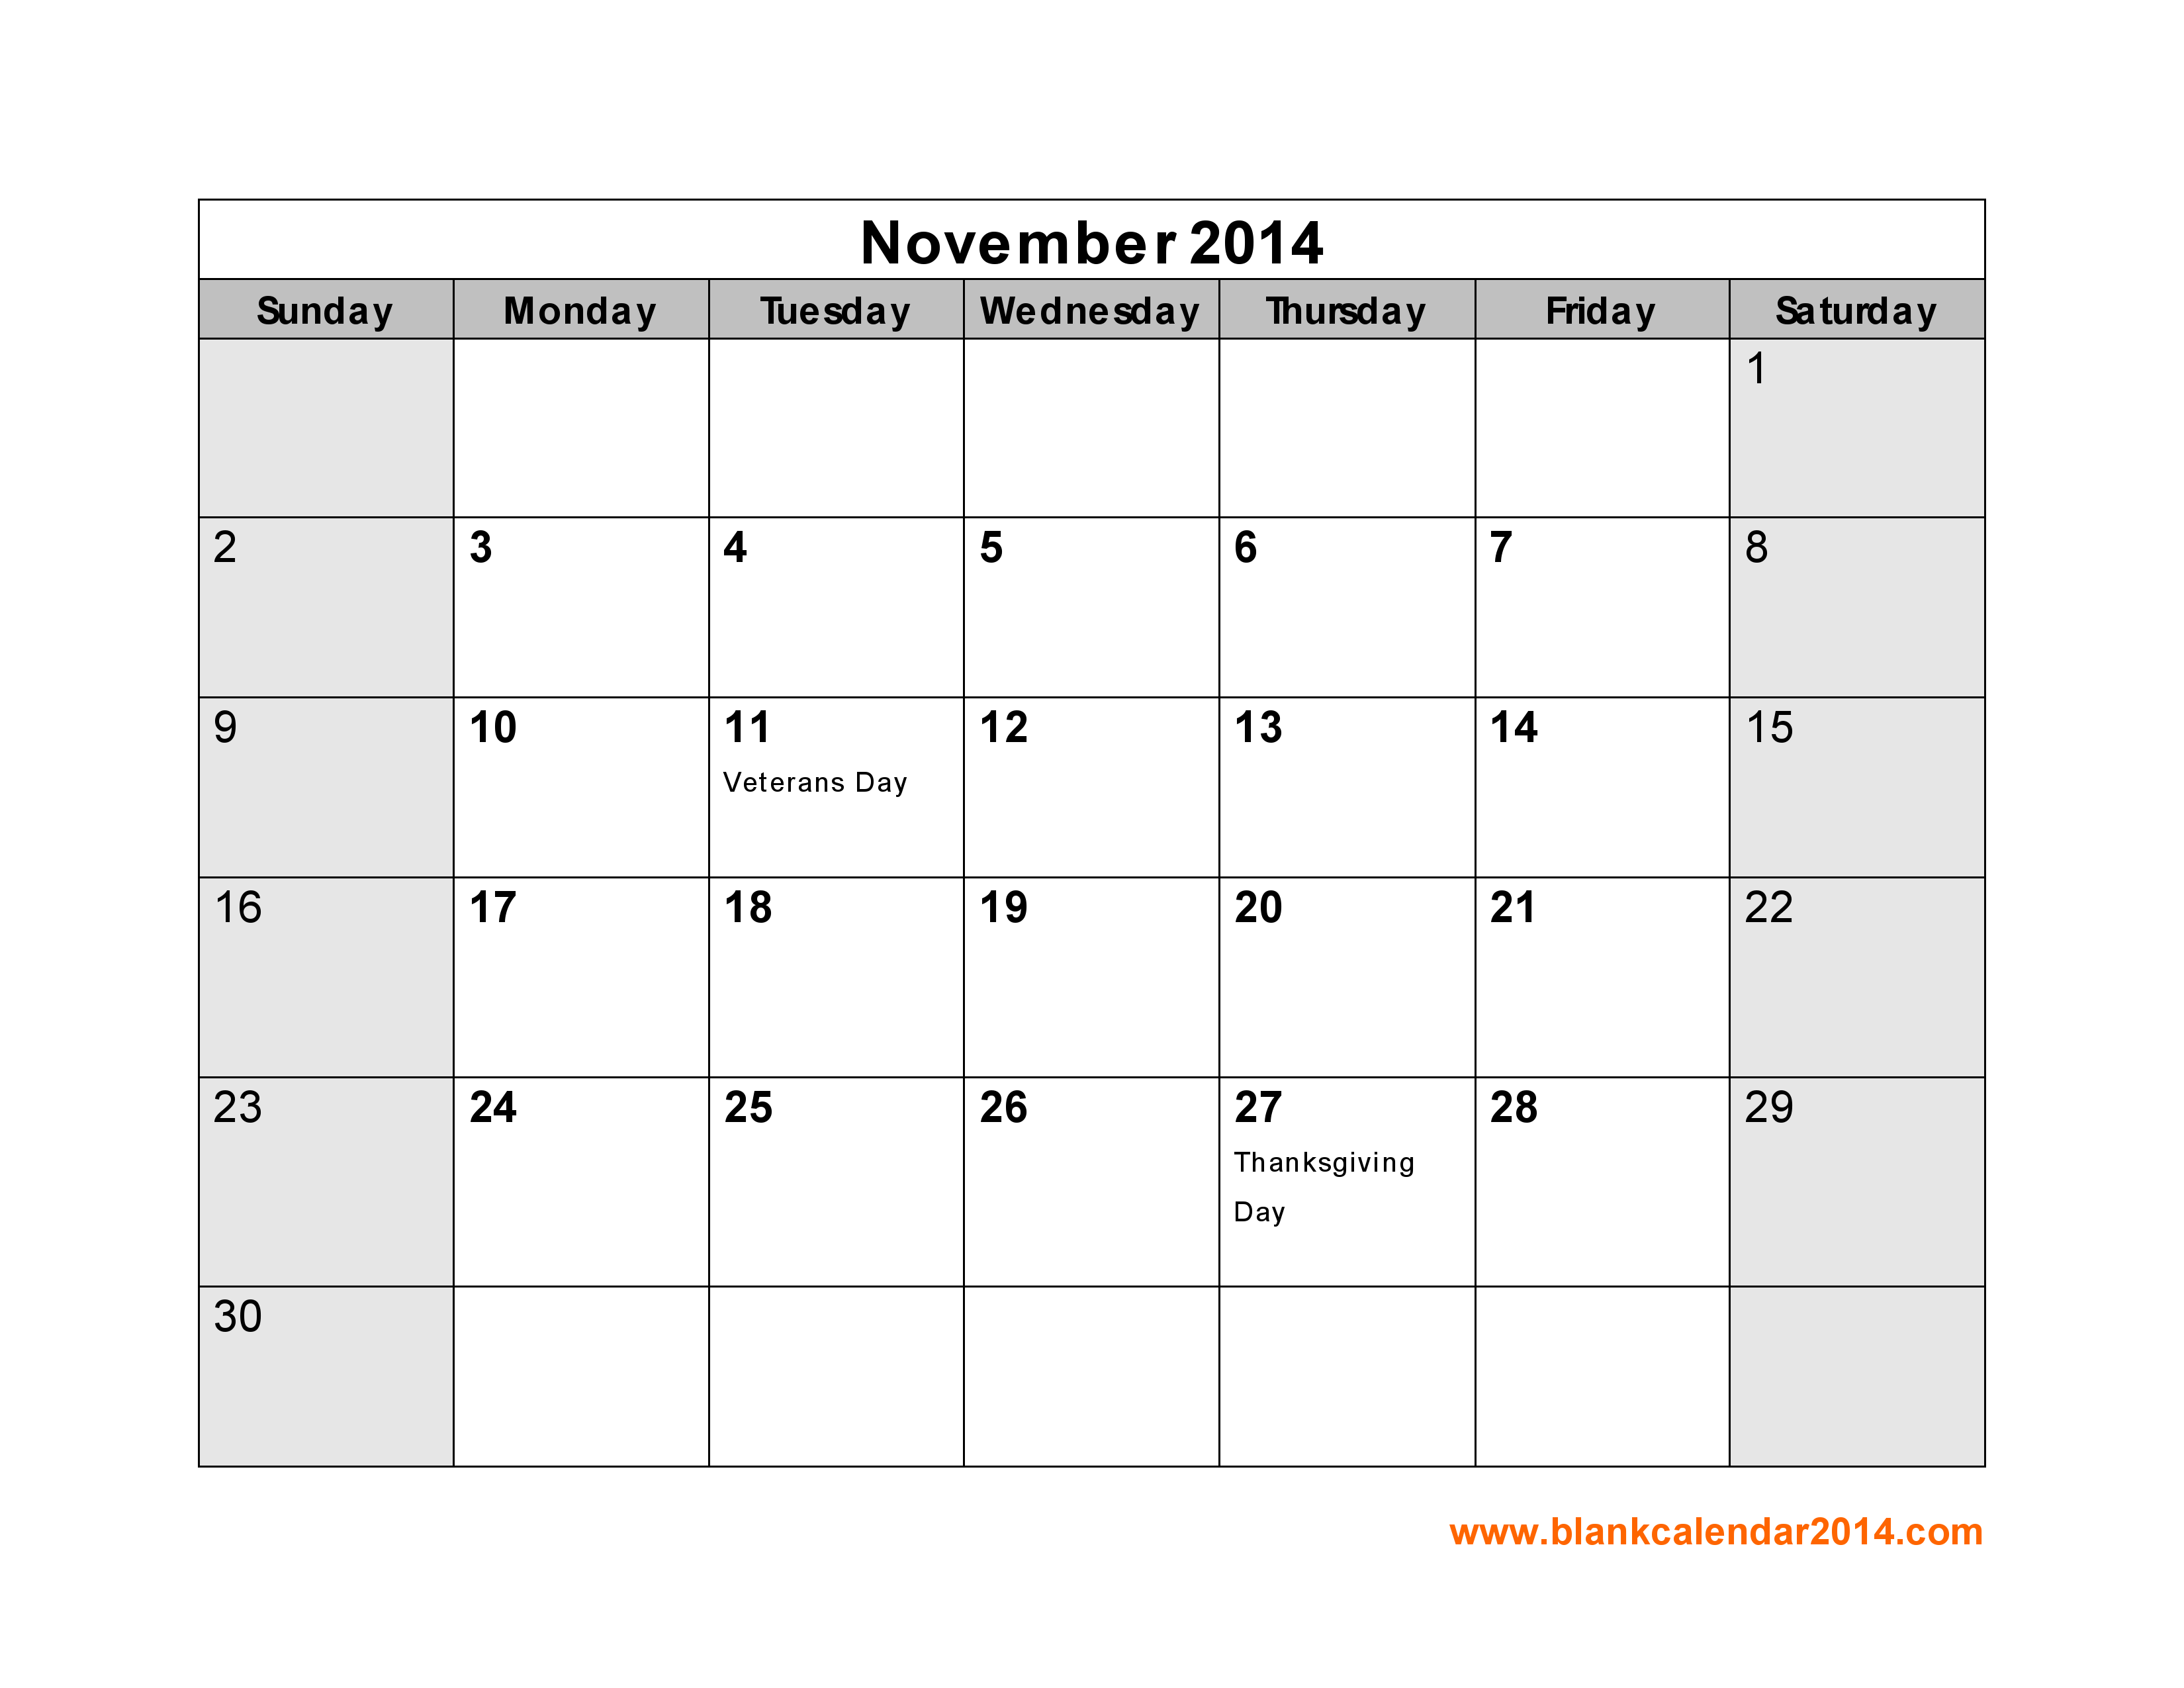 Blank Calendar Template November 2014 – Printable Editable Blank